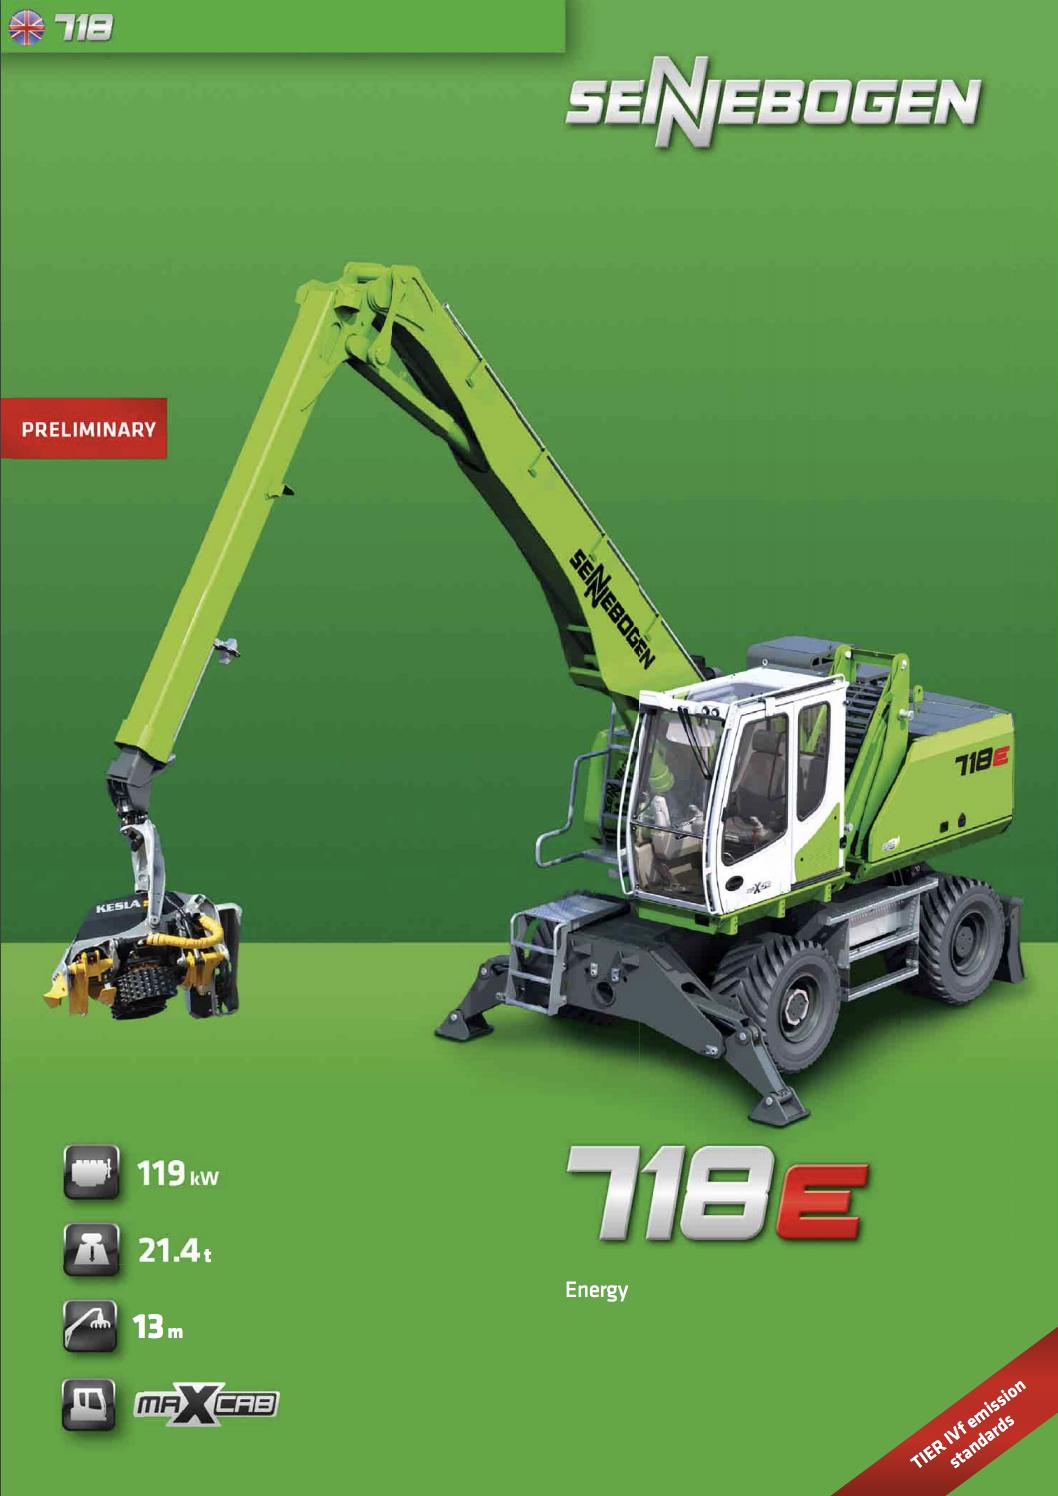 SENNEBOGEN-718E-Spec-Sheet